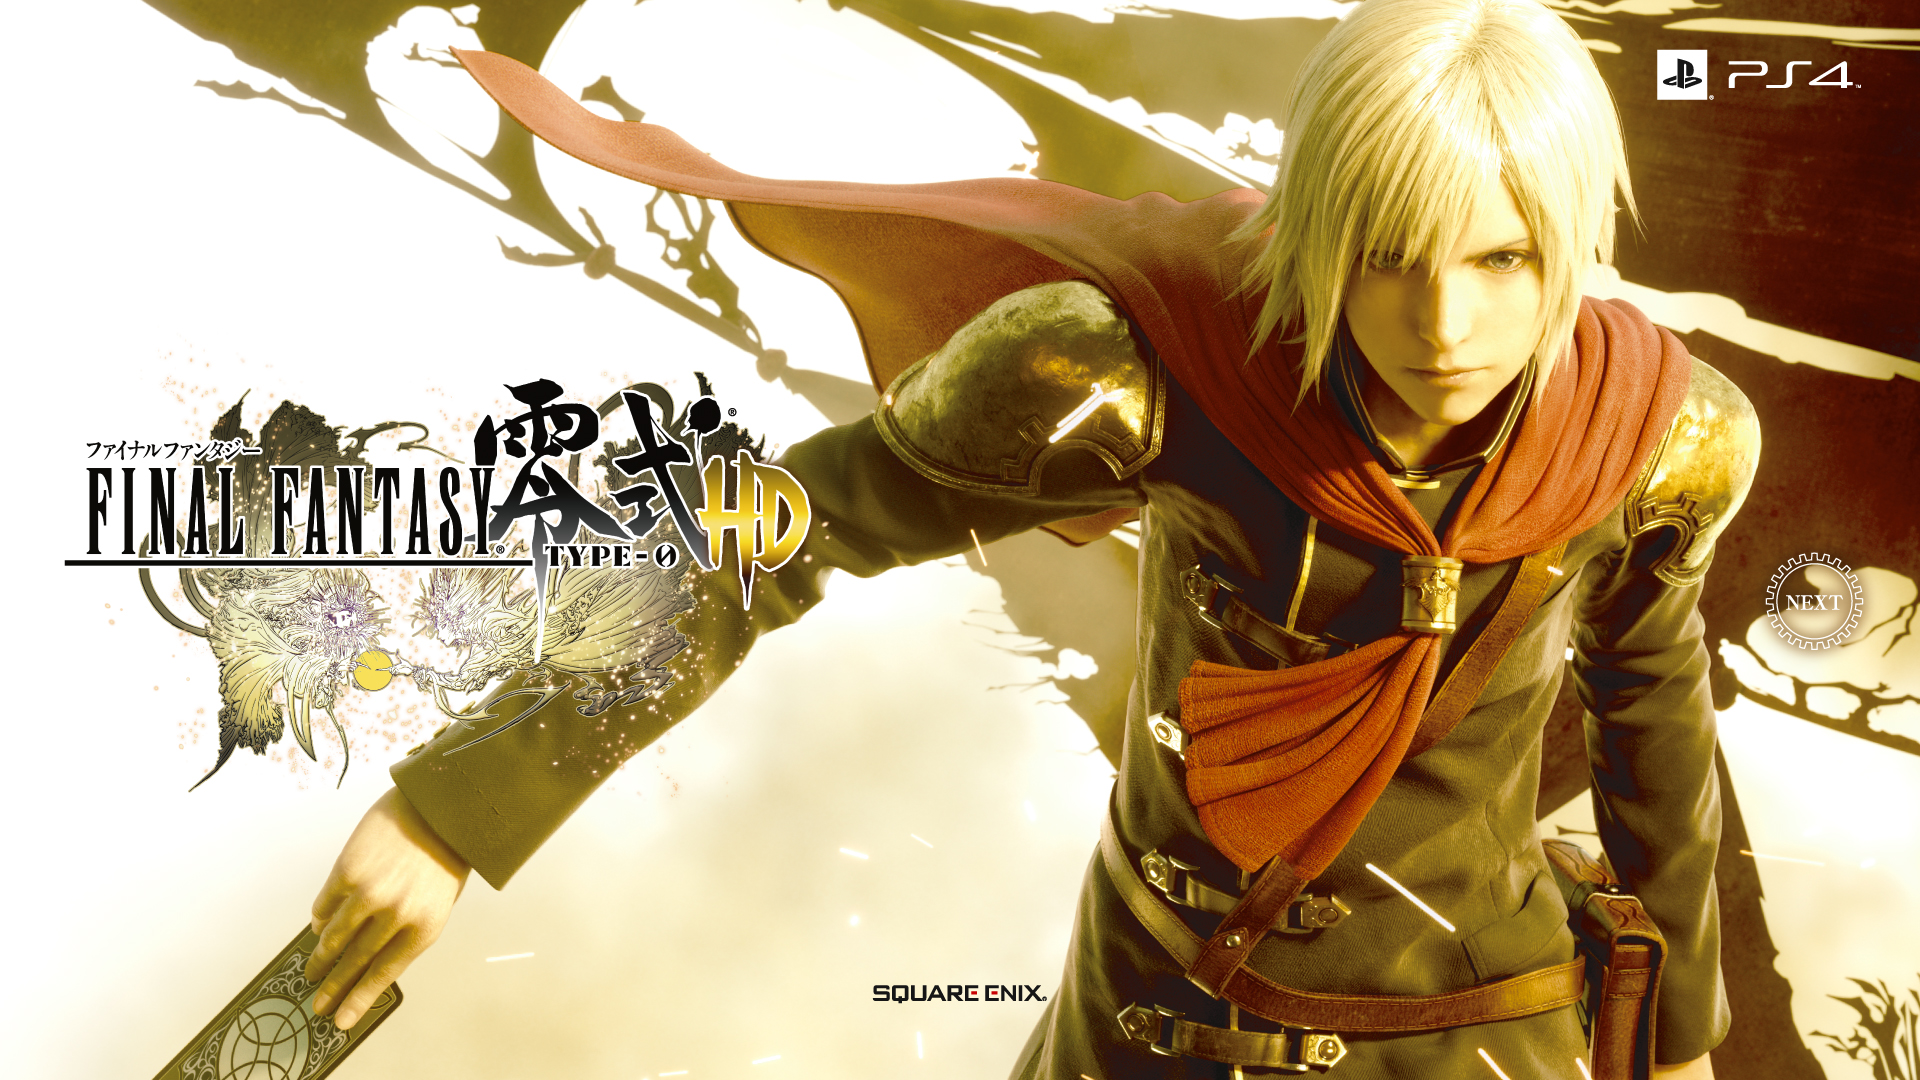 Final Fantasy Type 0 Hd Games 4k Wallpapers Images: FINAL FANTASY零式HD